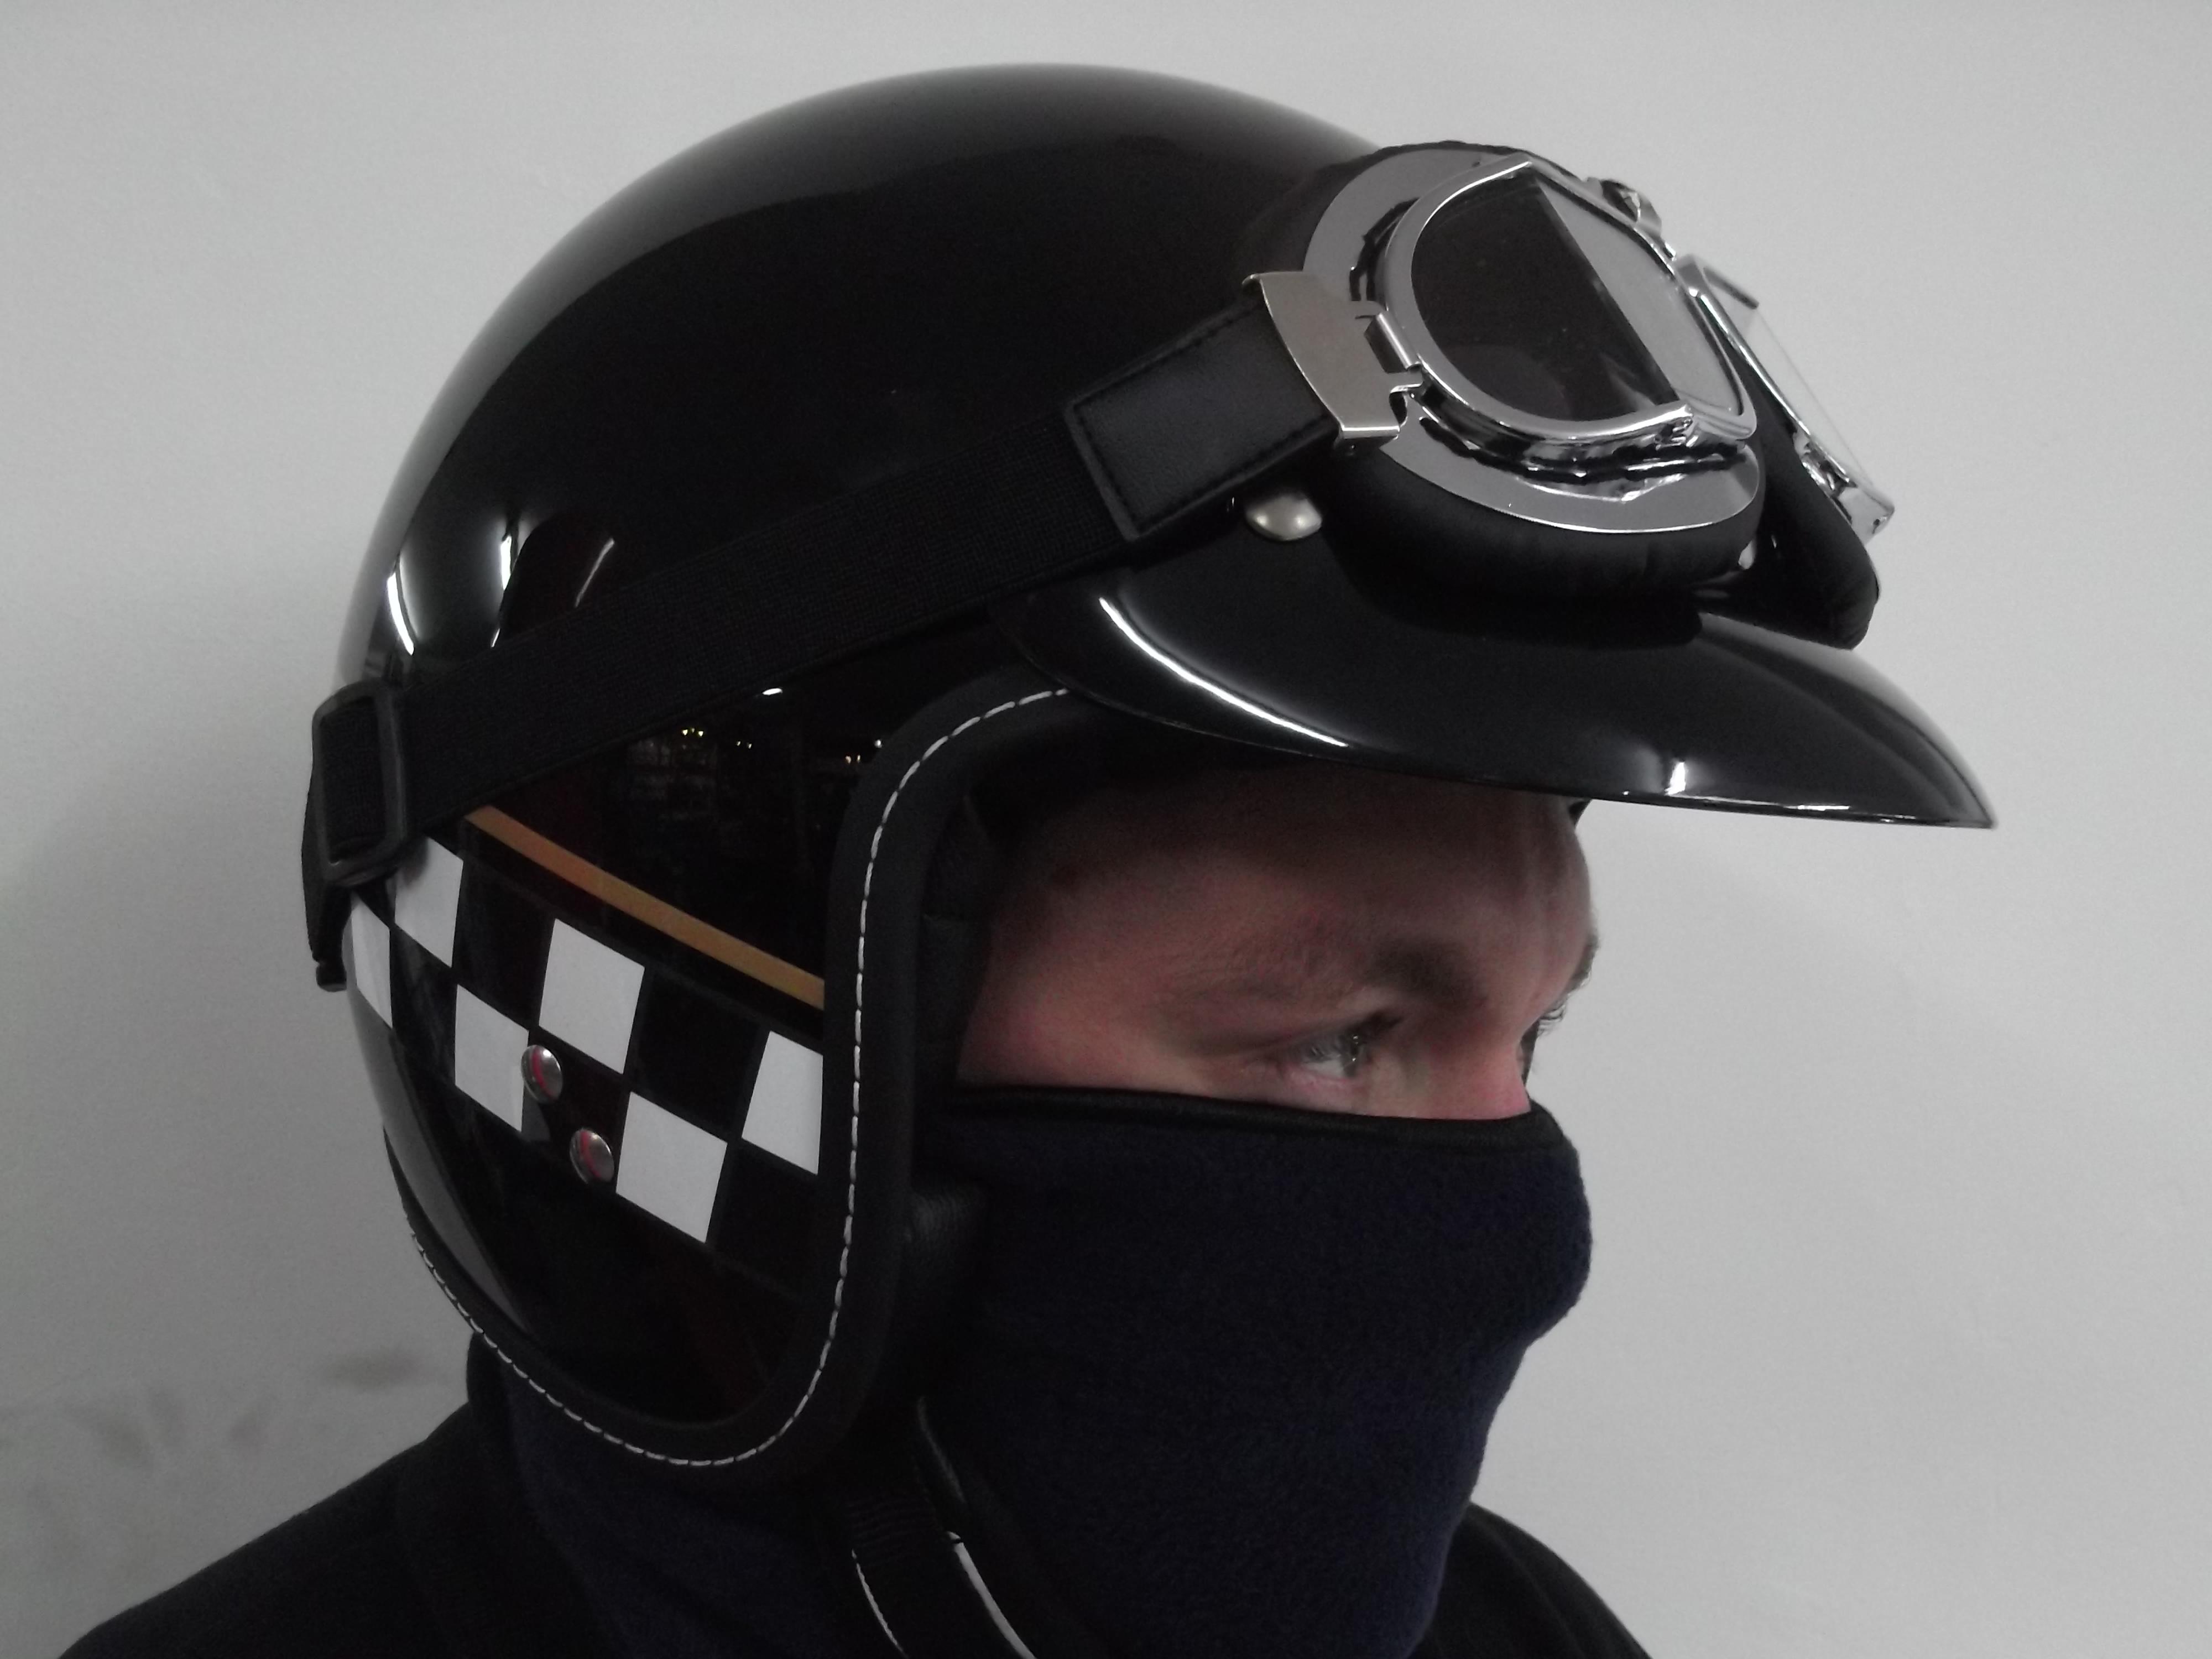 AGV RP60 Metal Flake Open-face Street Helmet Orange